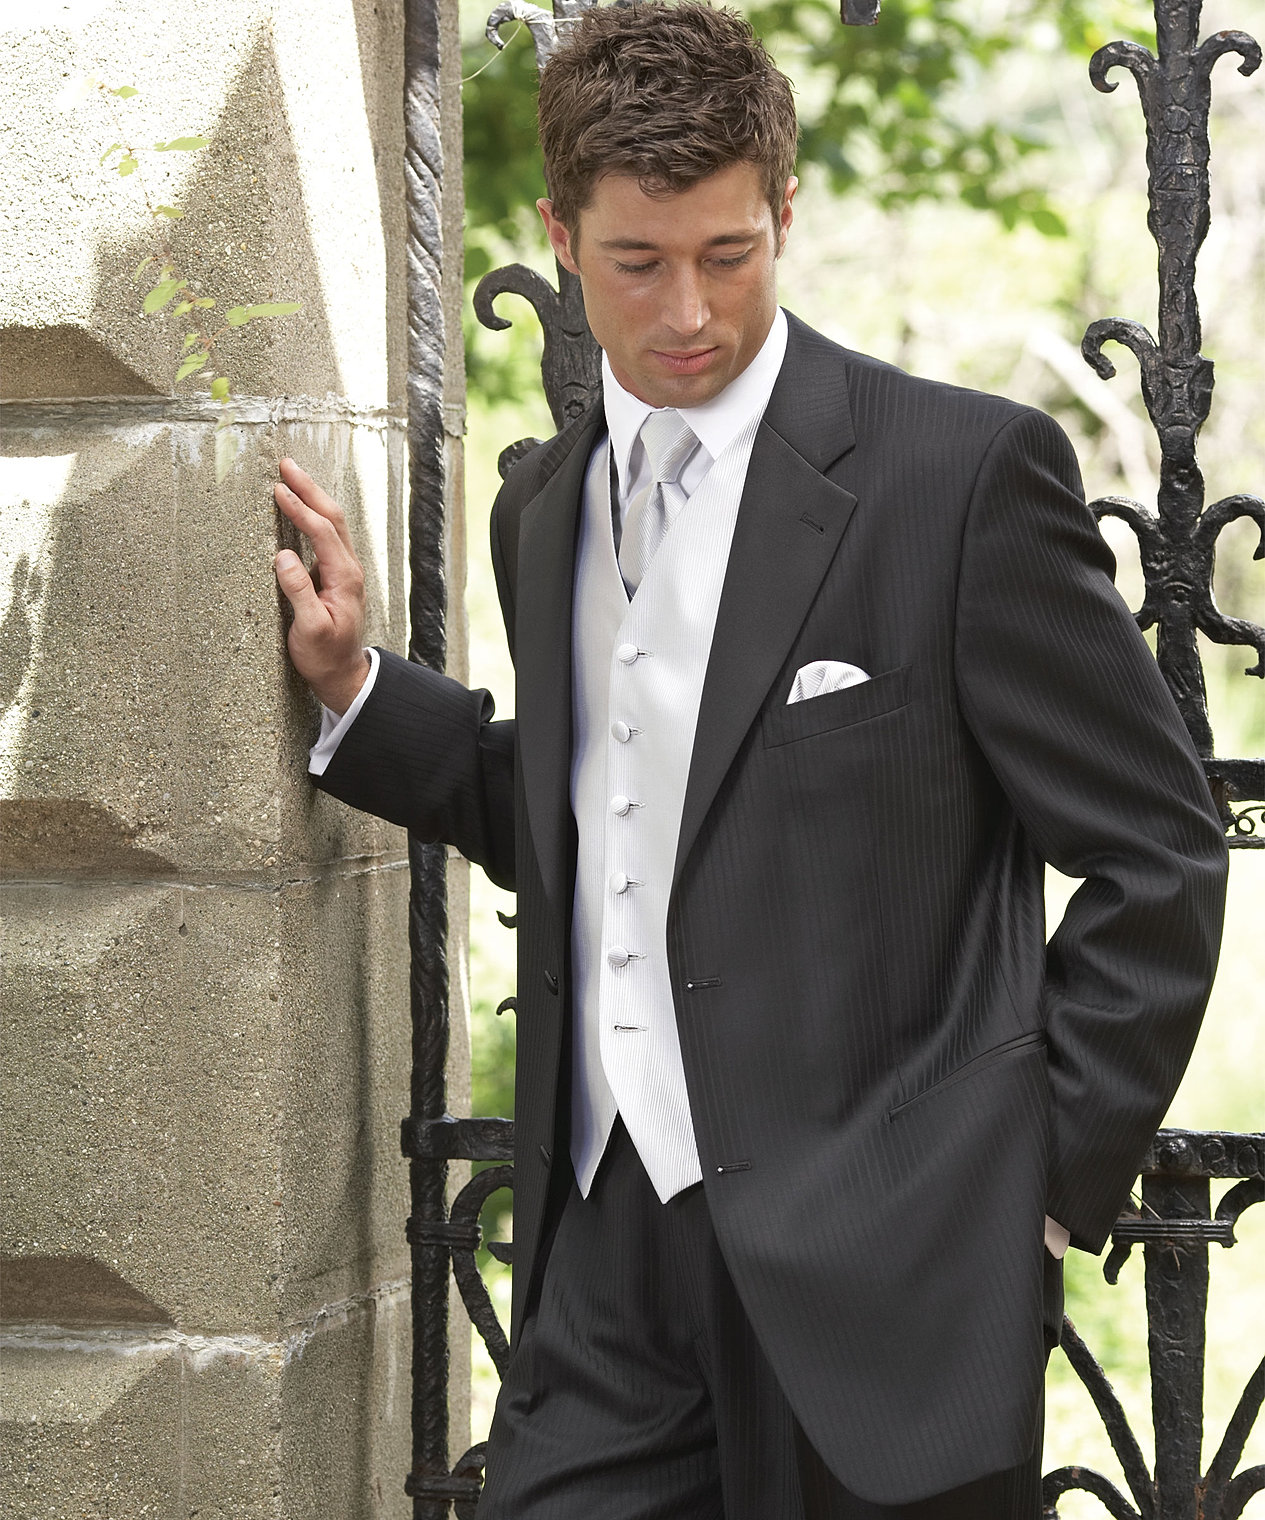 Tuxedos by santos,tuxedos,formalwear,rentals,suits,tuxedo rentals ...